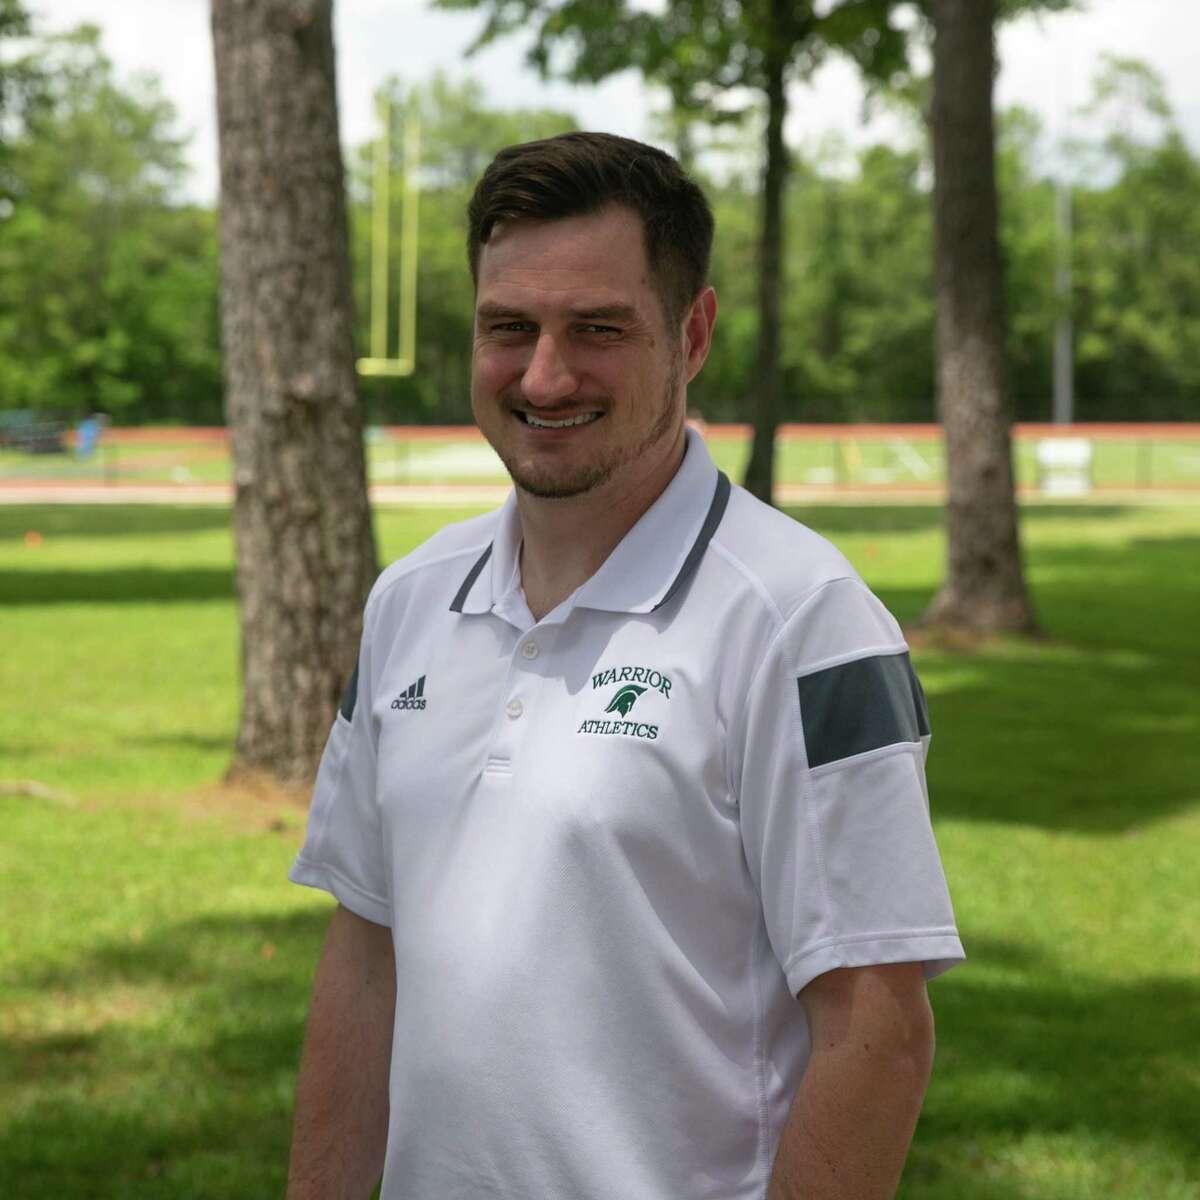 TWCA soccer coach Chris White.